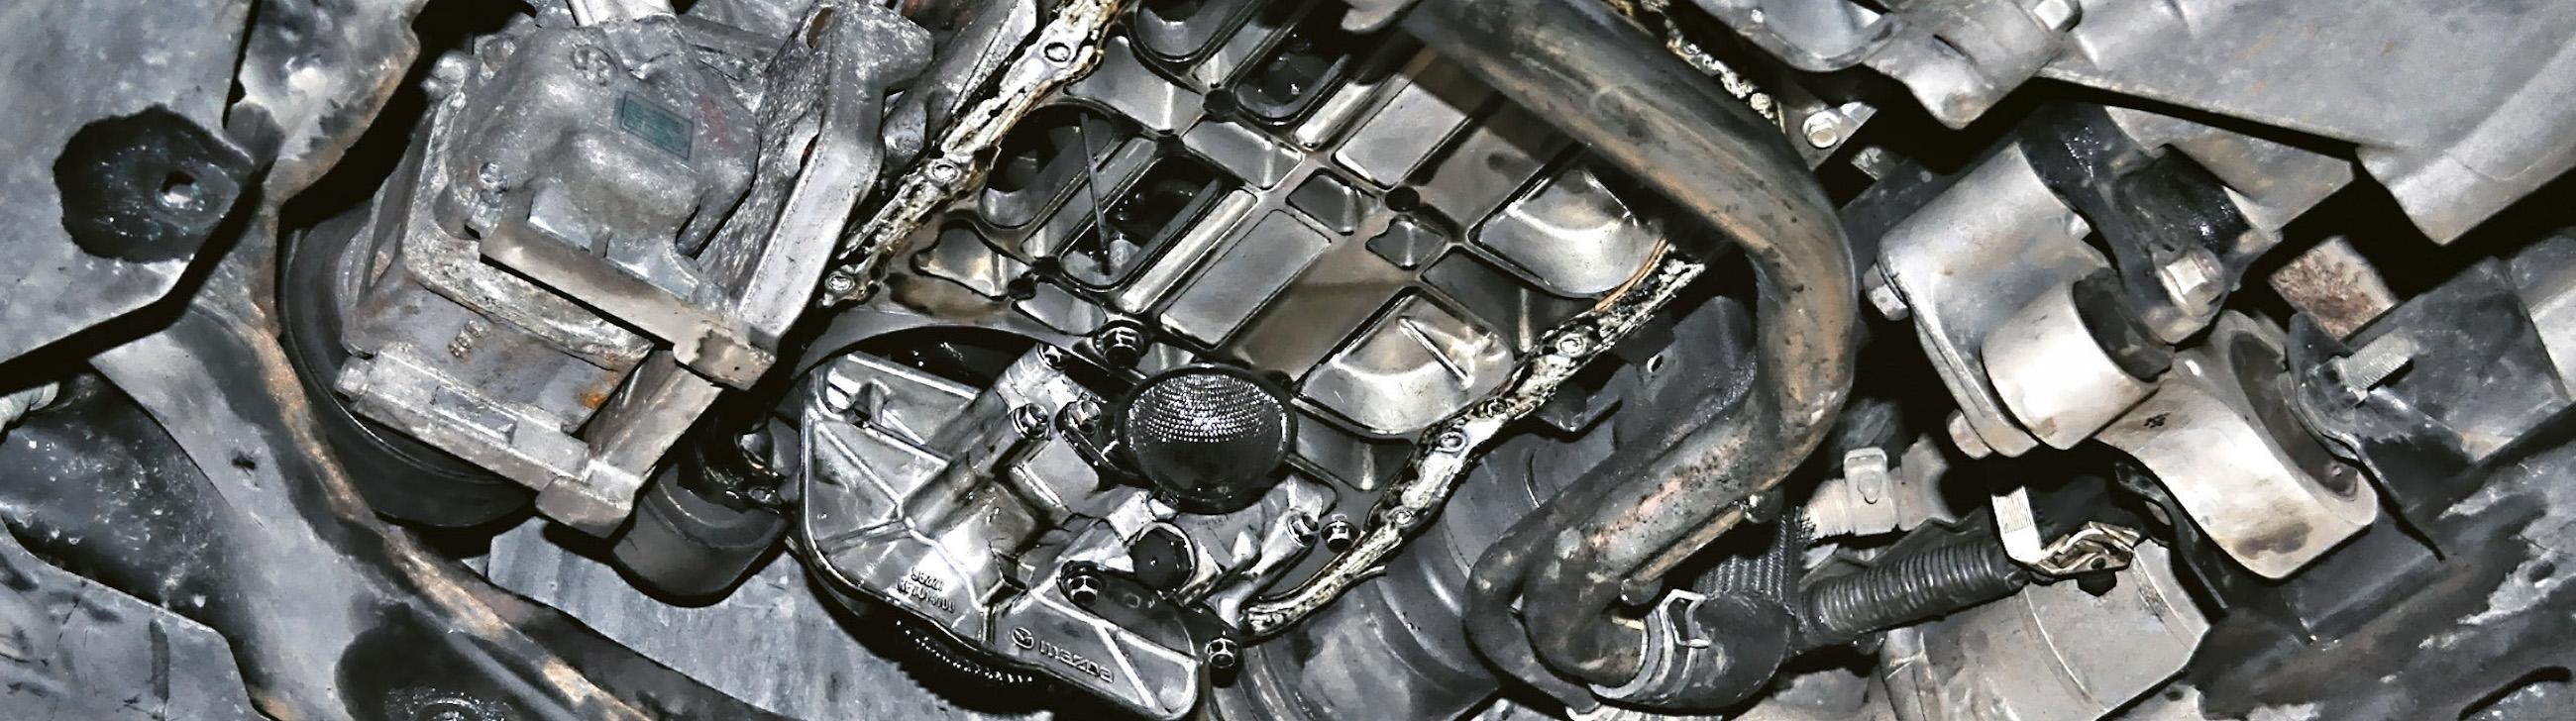 Smok olejowy Mazda diesel